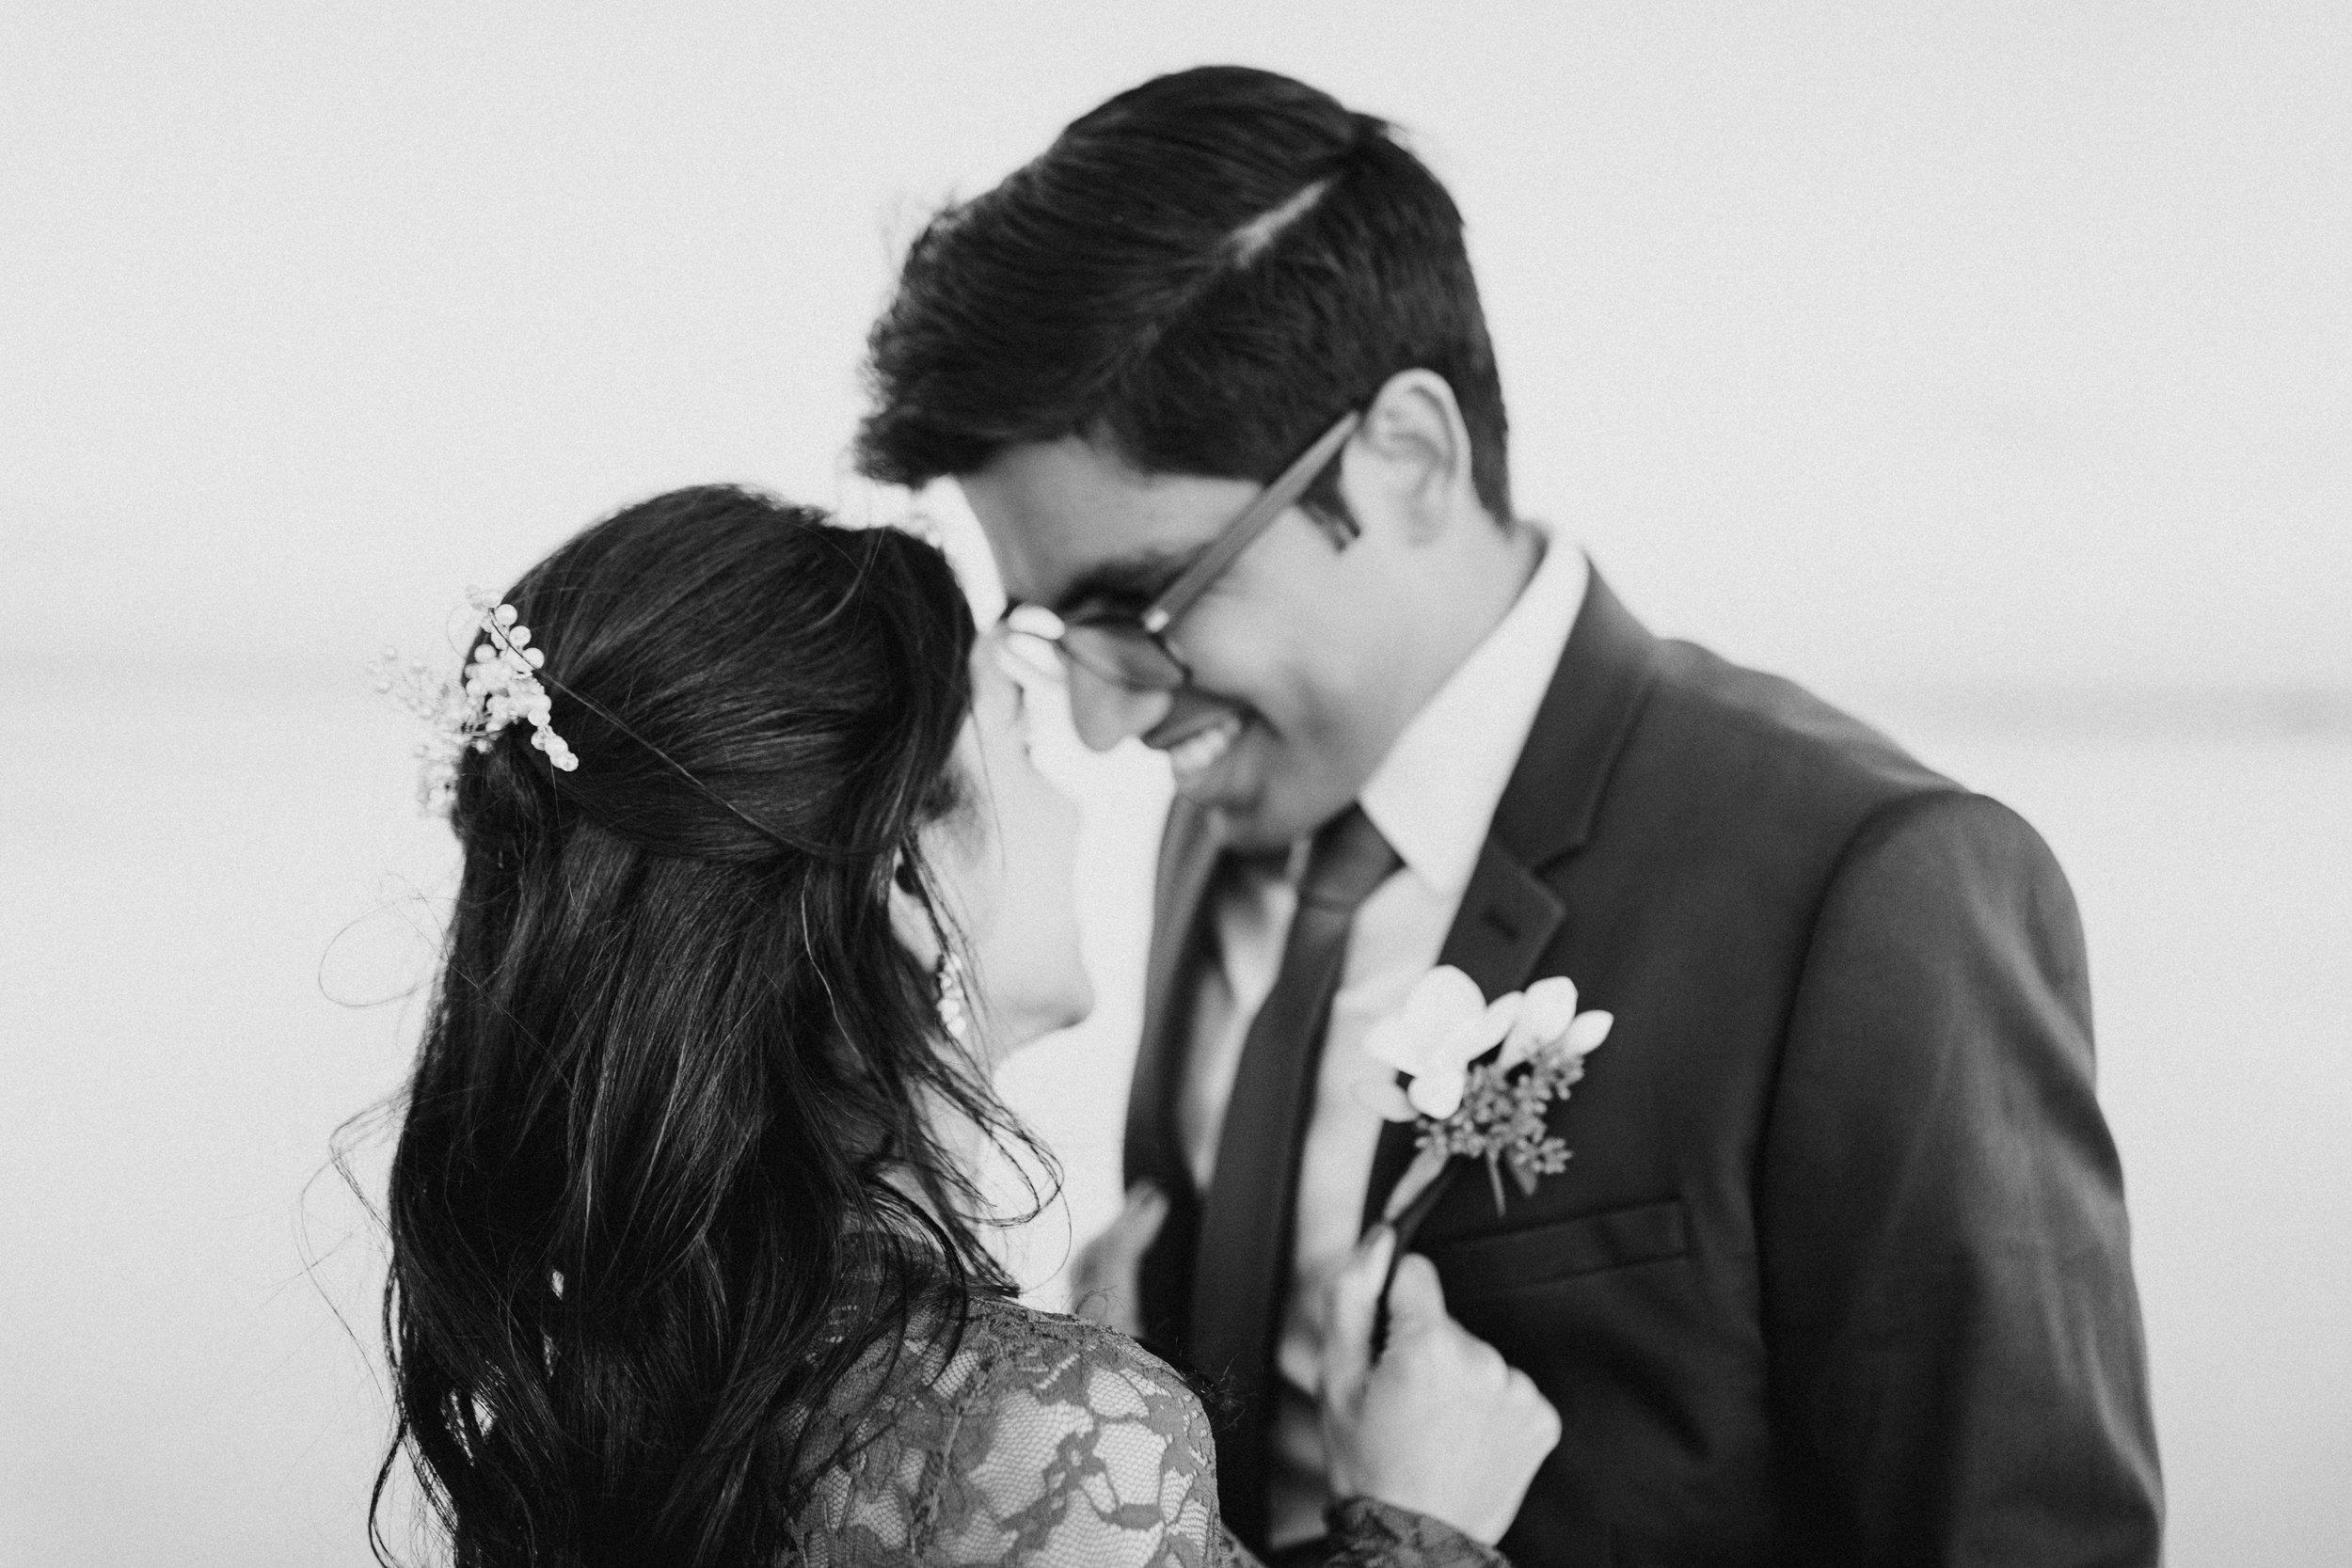 bonneville-salt-flats-engagement-couple-photos-destination-wedding-photography-19.jpg